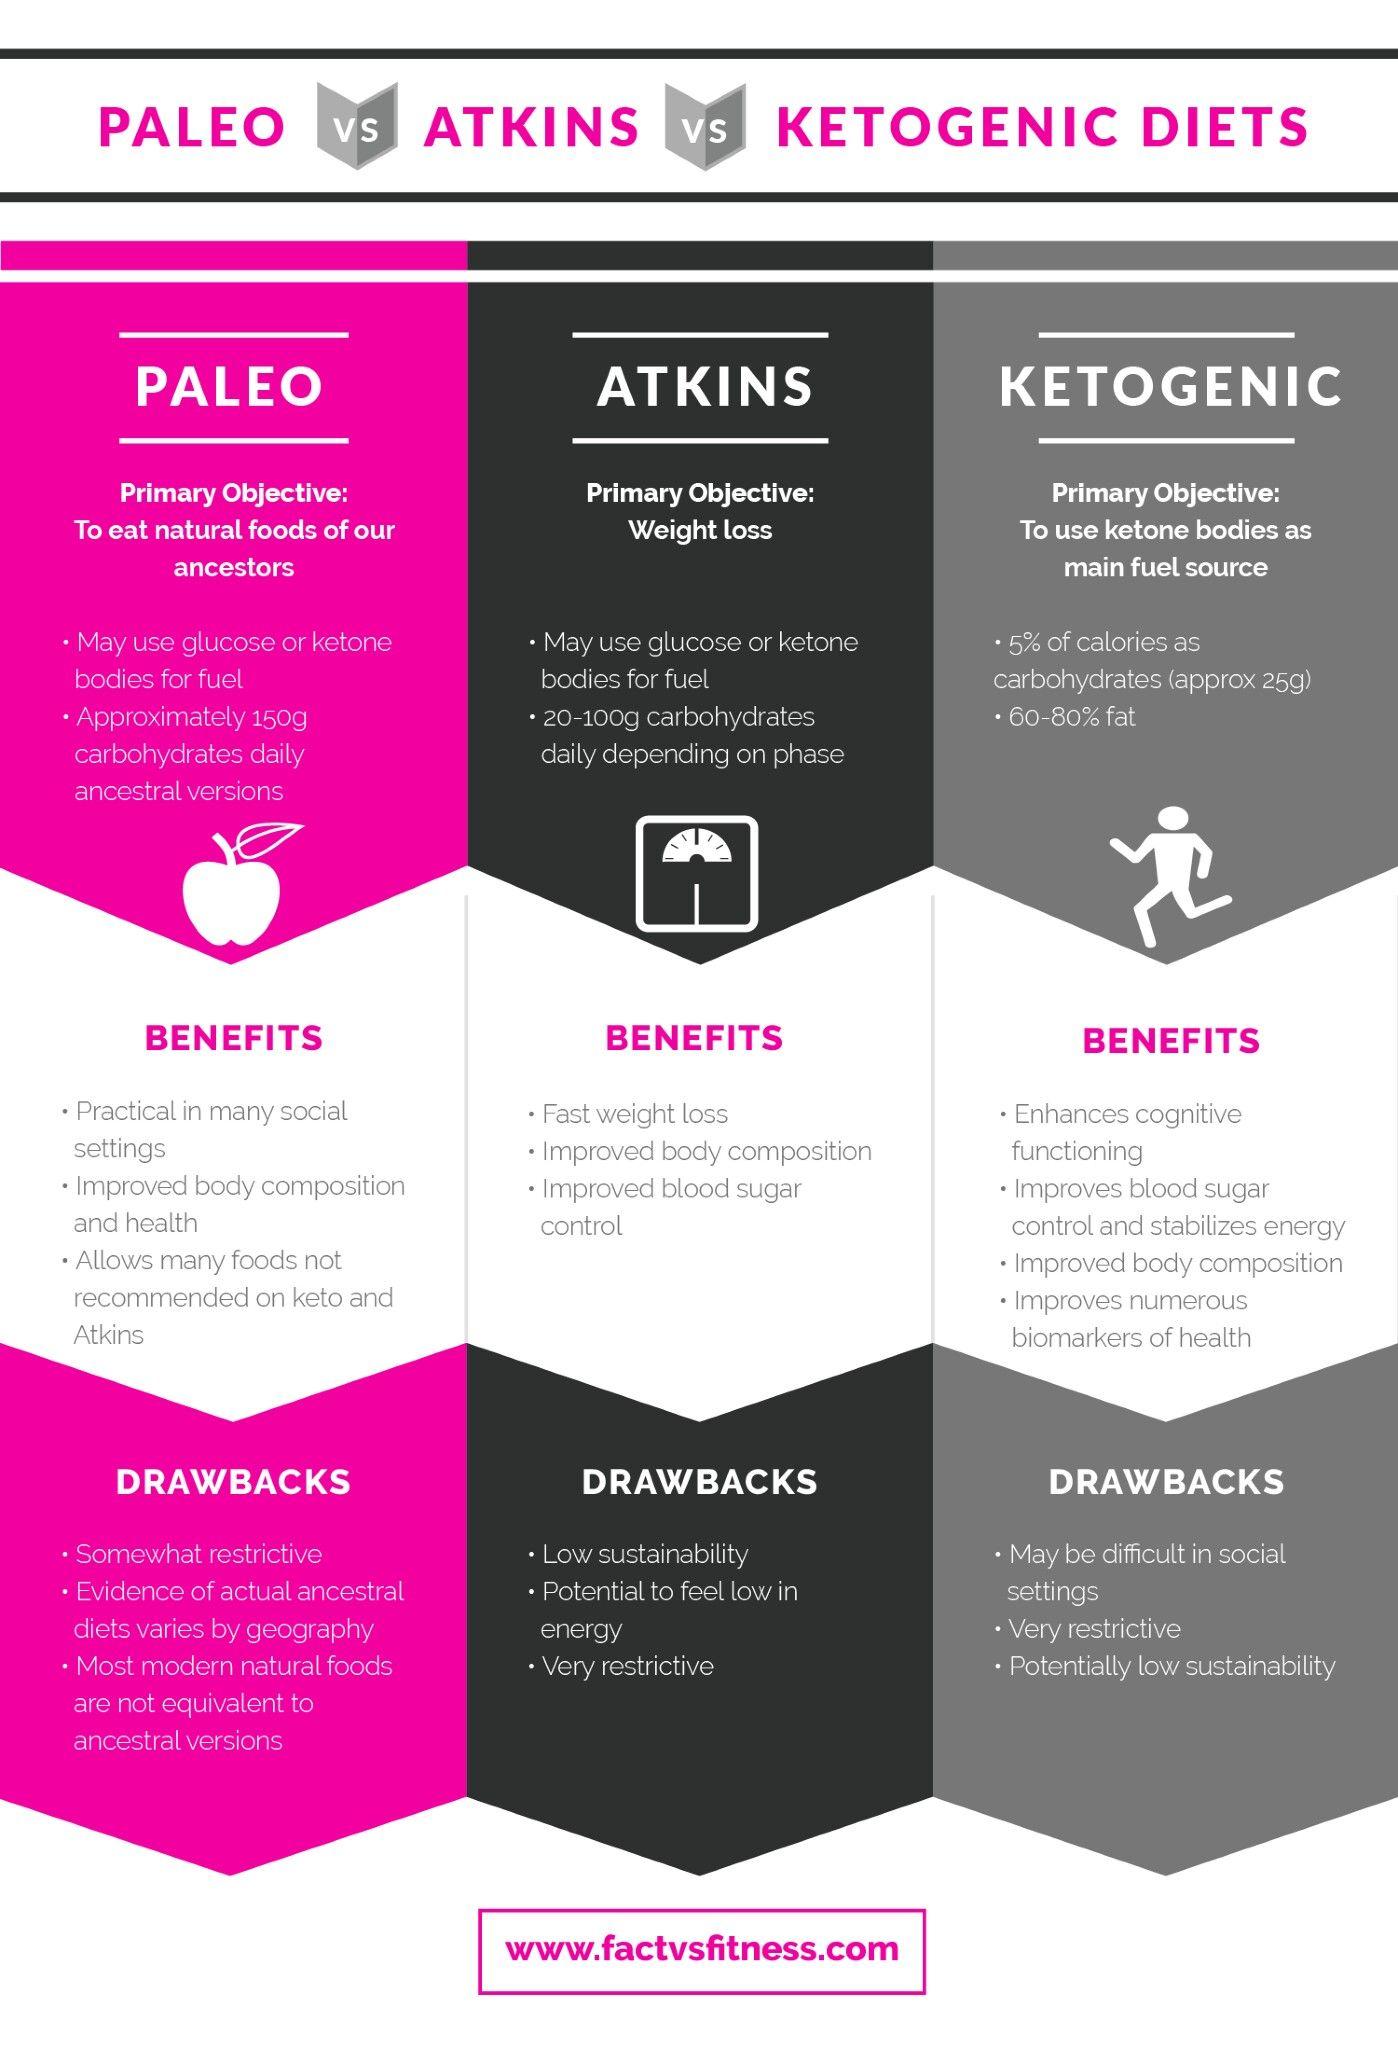 Paleo vs Keto diet: Which low-carb diet is best